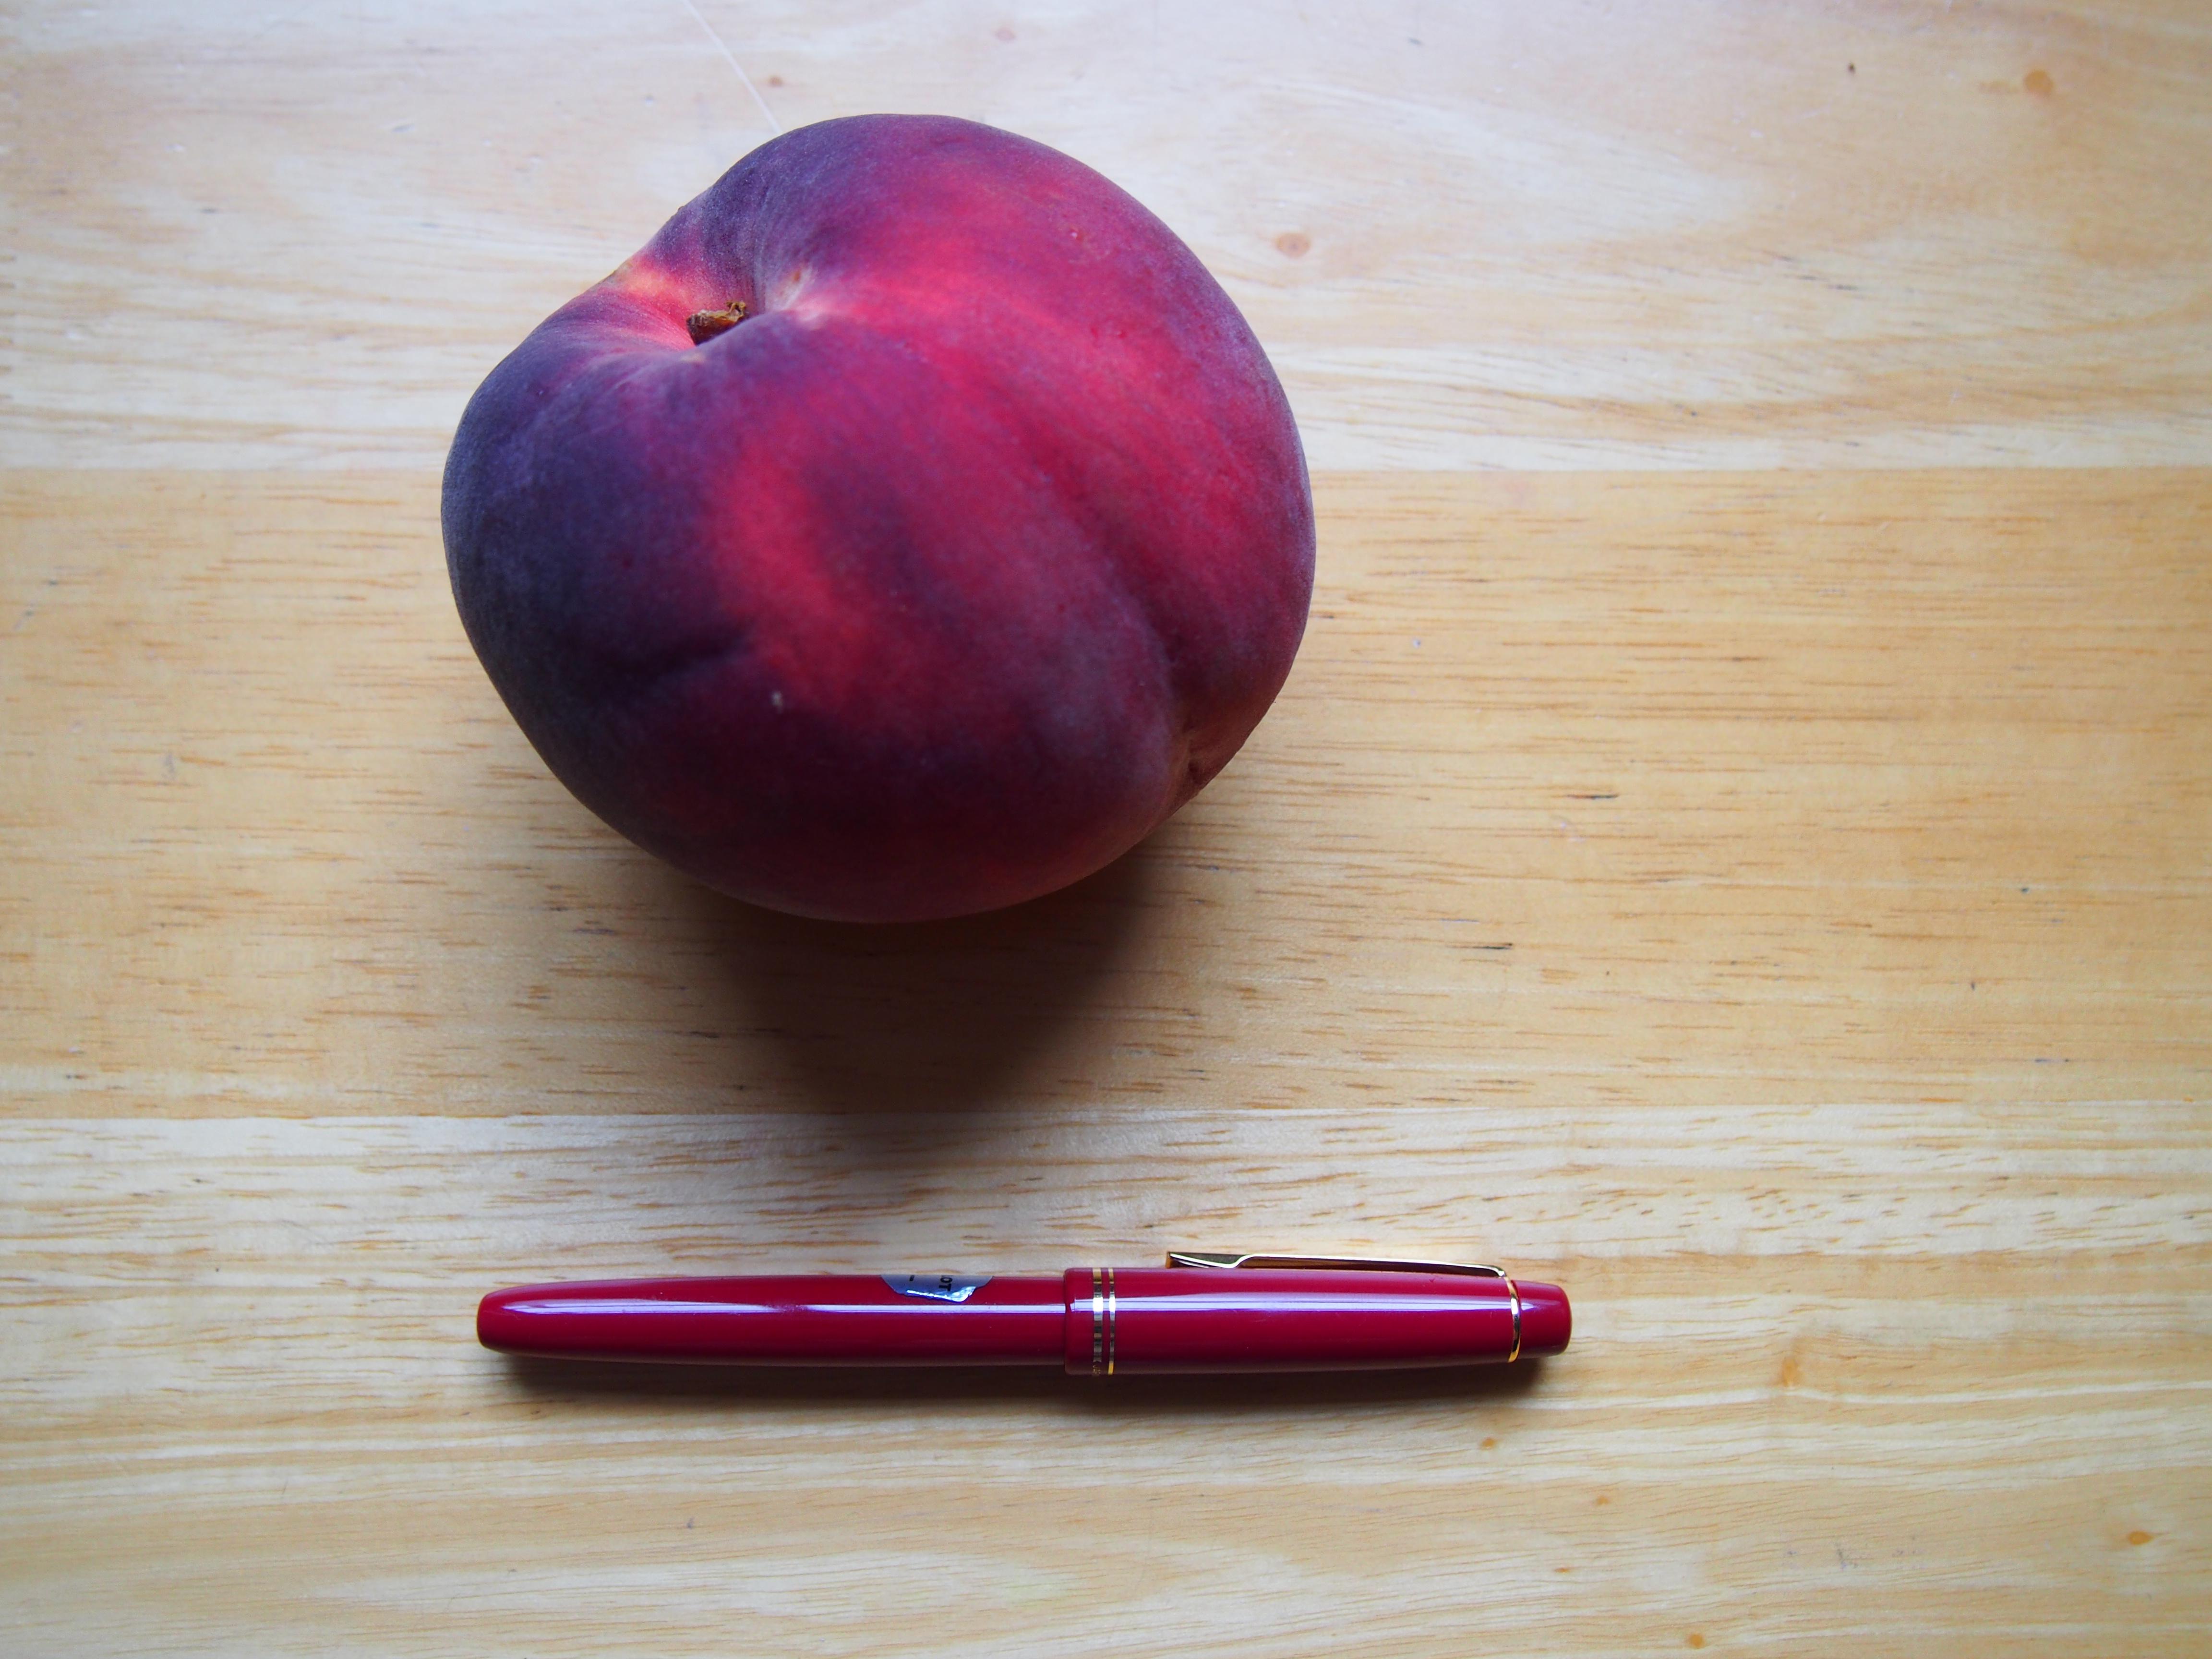 A very large peach